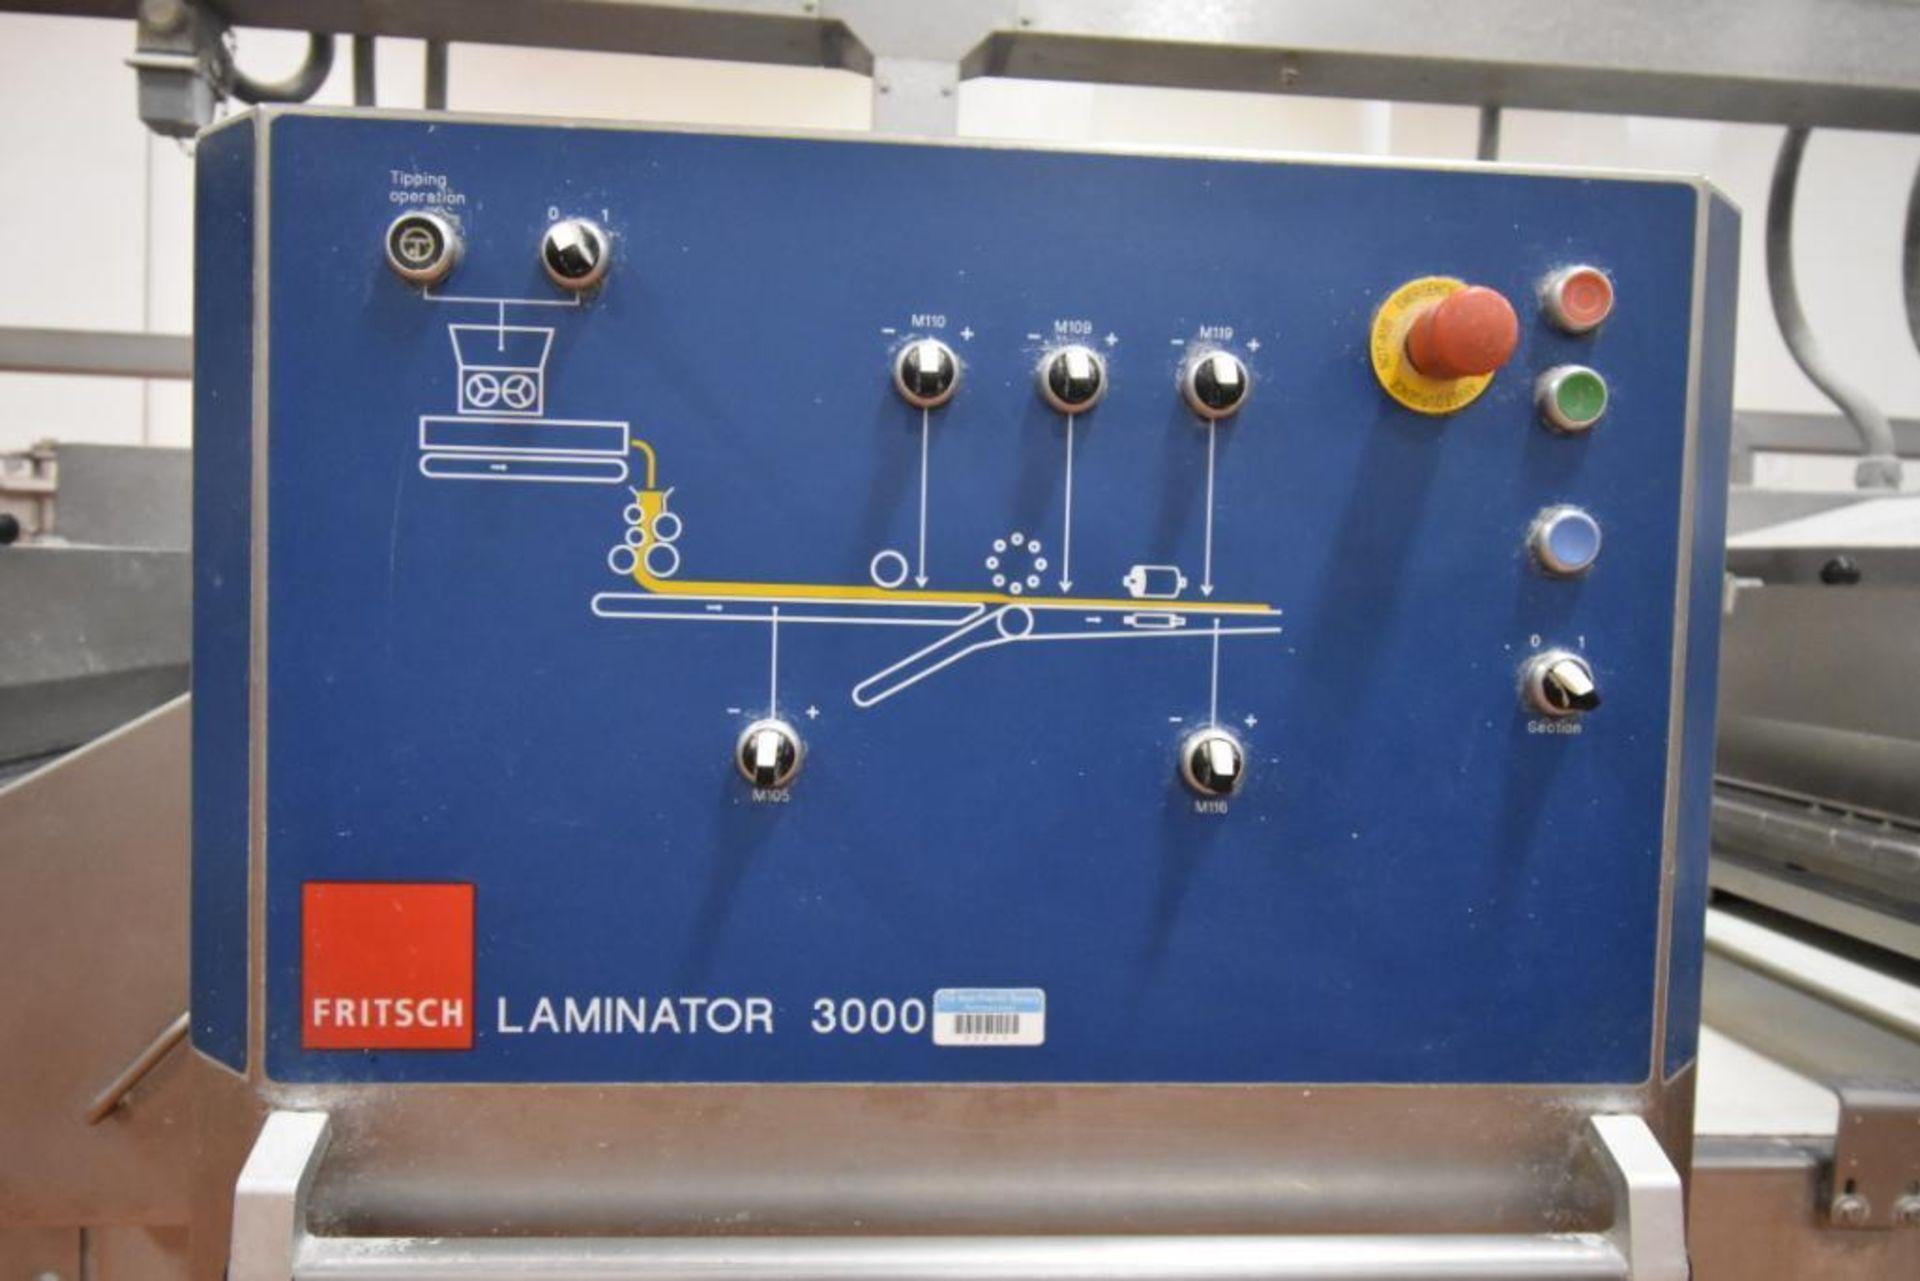 2007 Fritsch Laminator 3000 dough line - Image 62 of 280